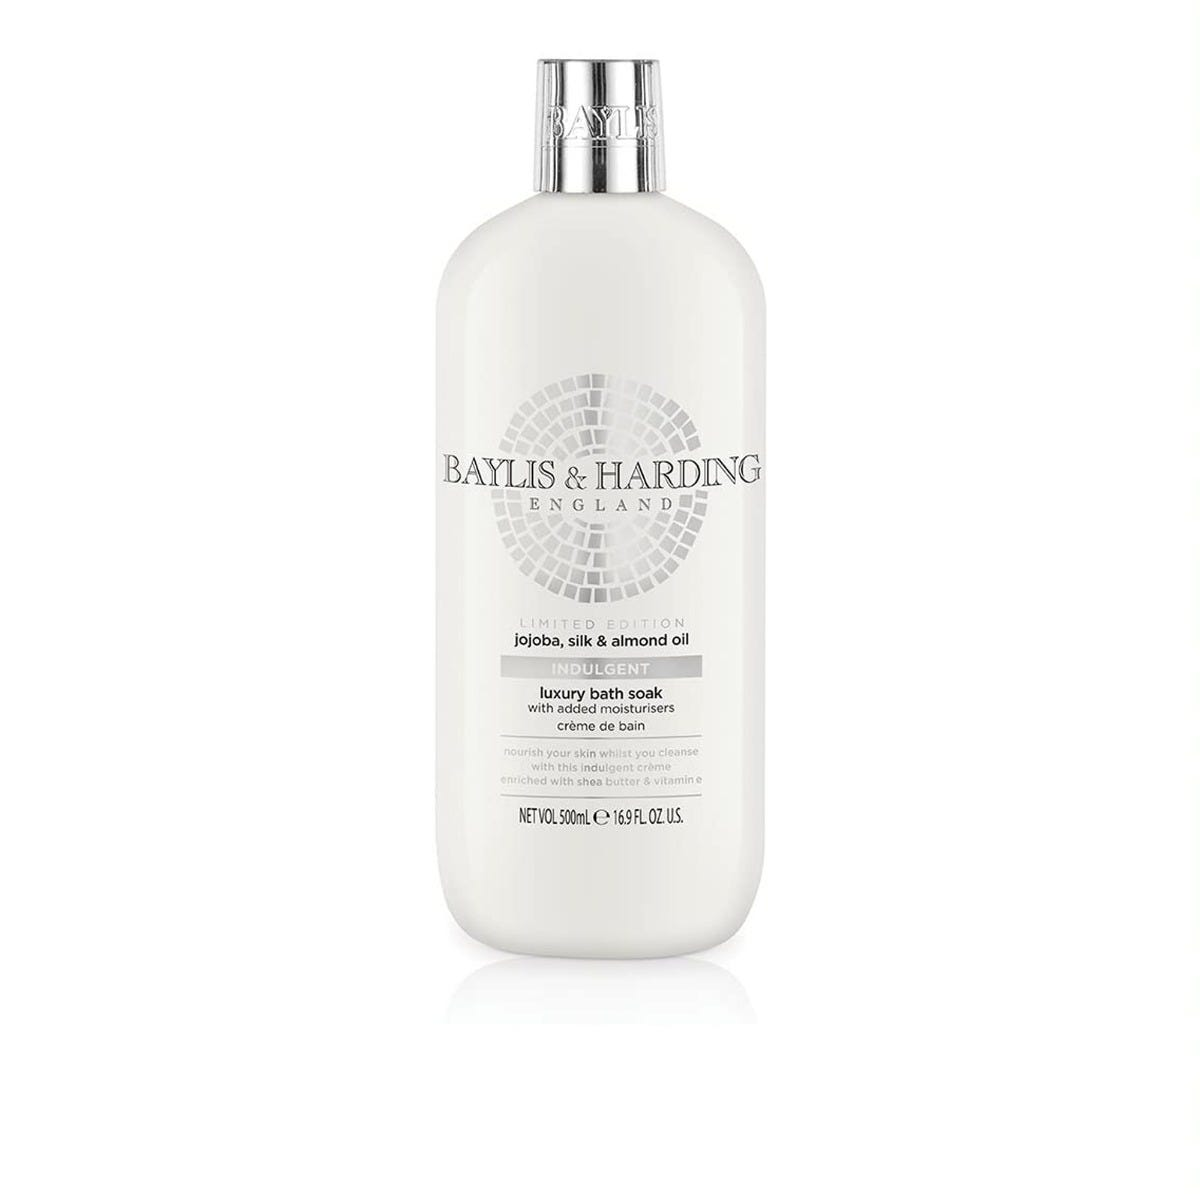 Gel para tina de baño Baylis & Harding® aroma jojoba y almendras